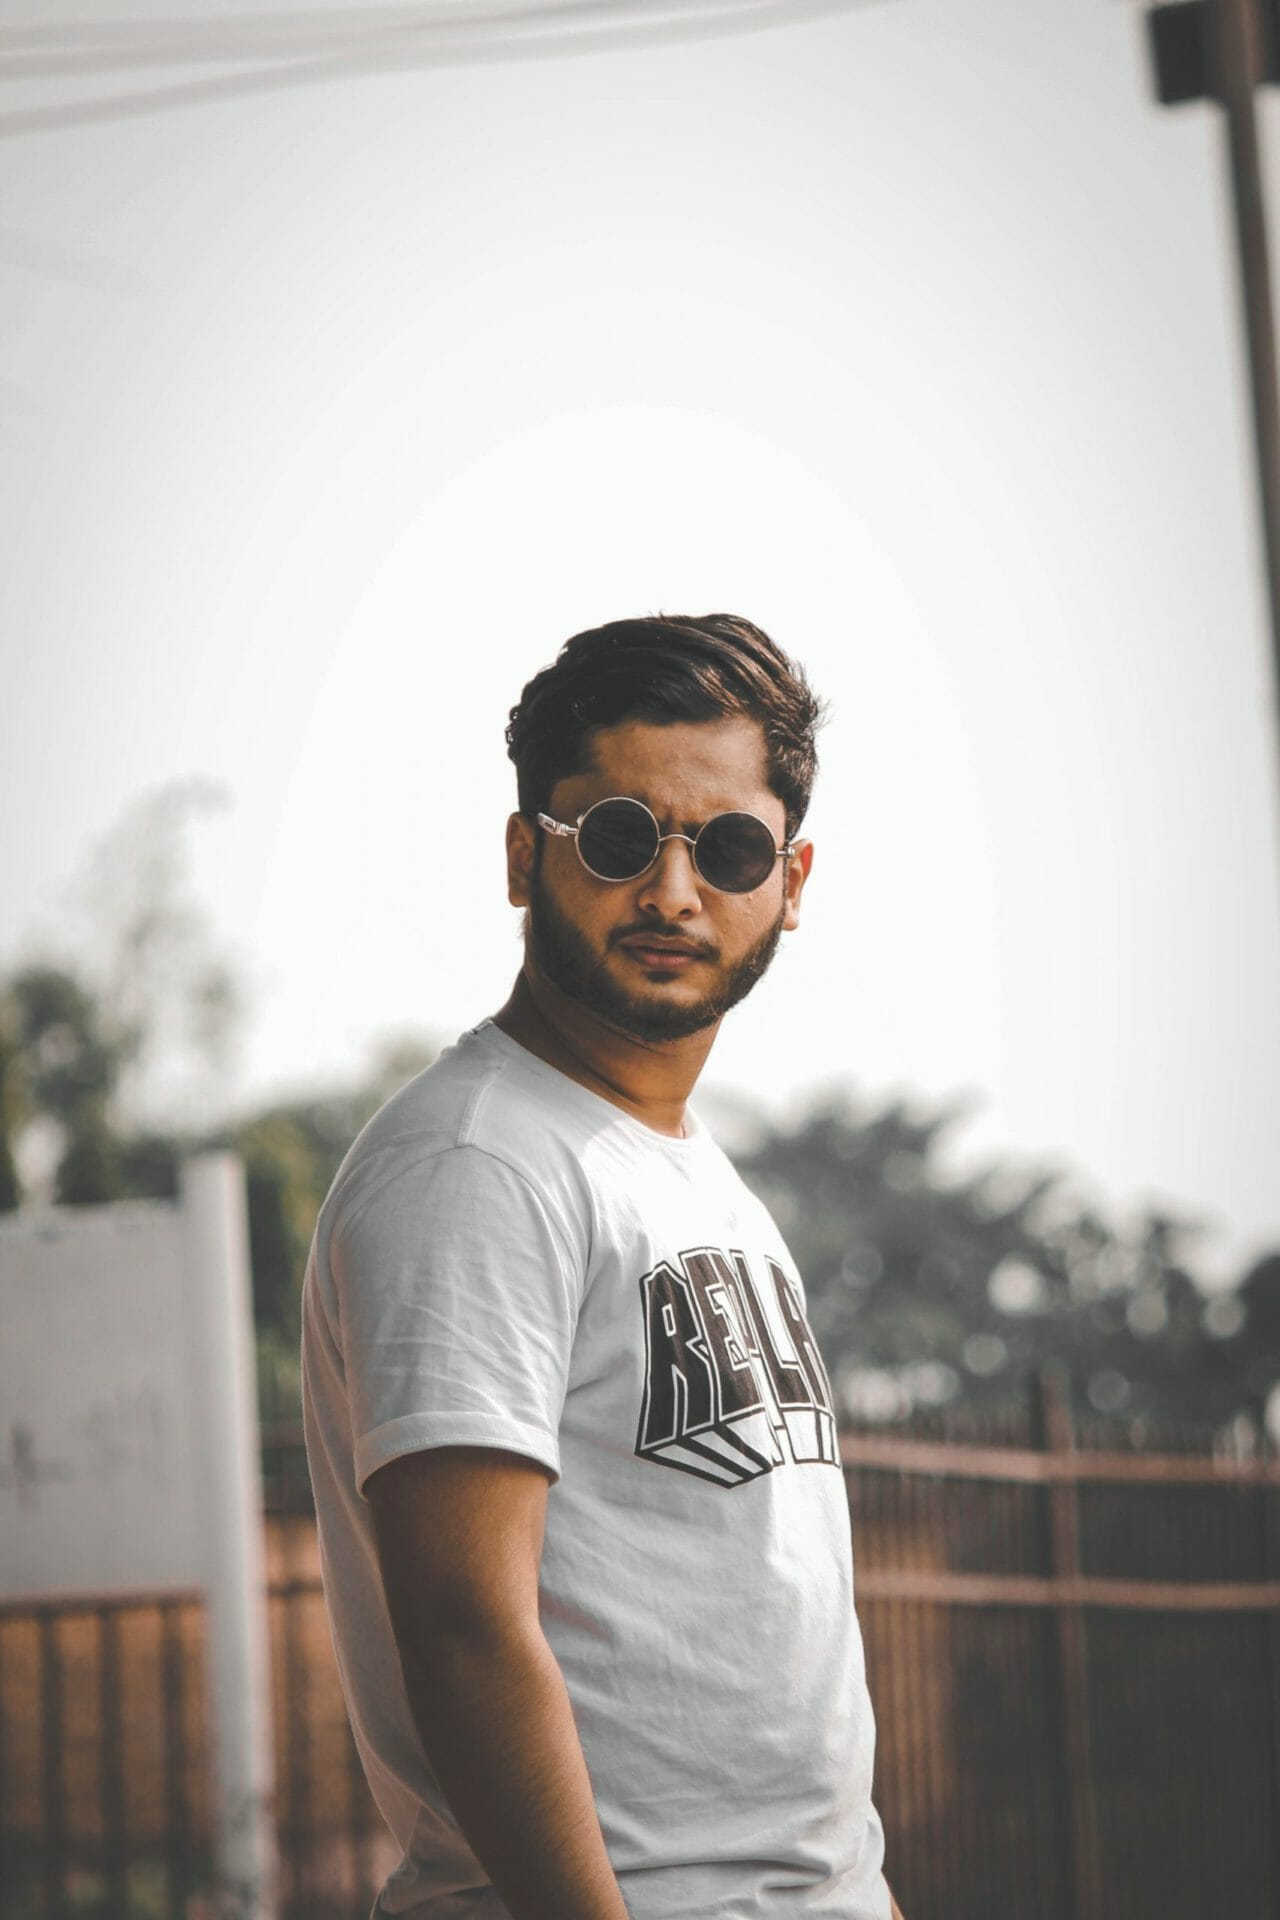 adib-hussain-5CTTfIuYVak-unsplash